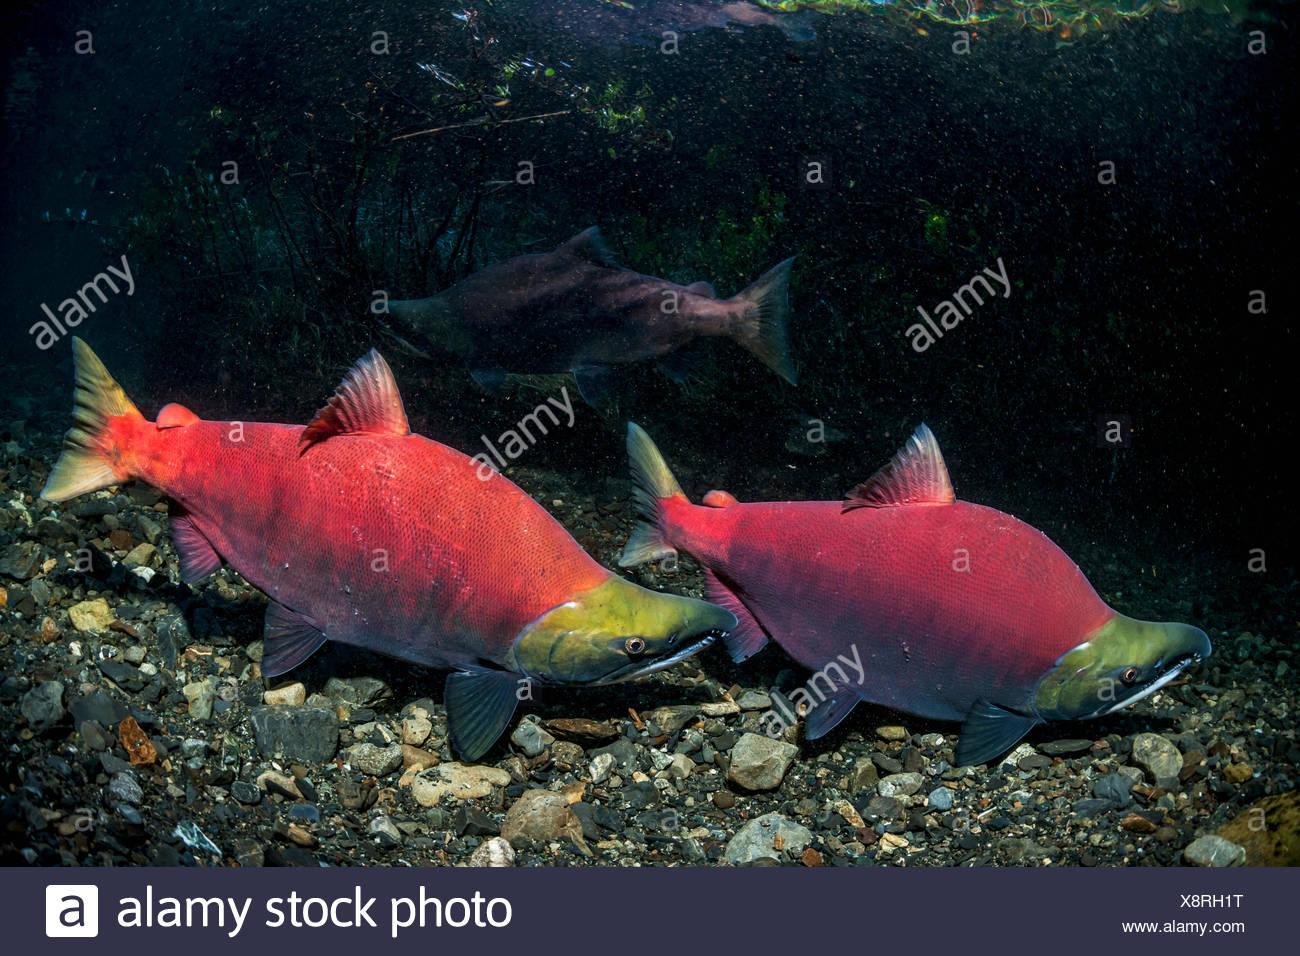 Alpha Sockeye Salmon (Oncorhynchus nerka) male chasing away a rival in an Alaskan stream during early summer. - Stock Image